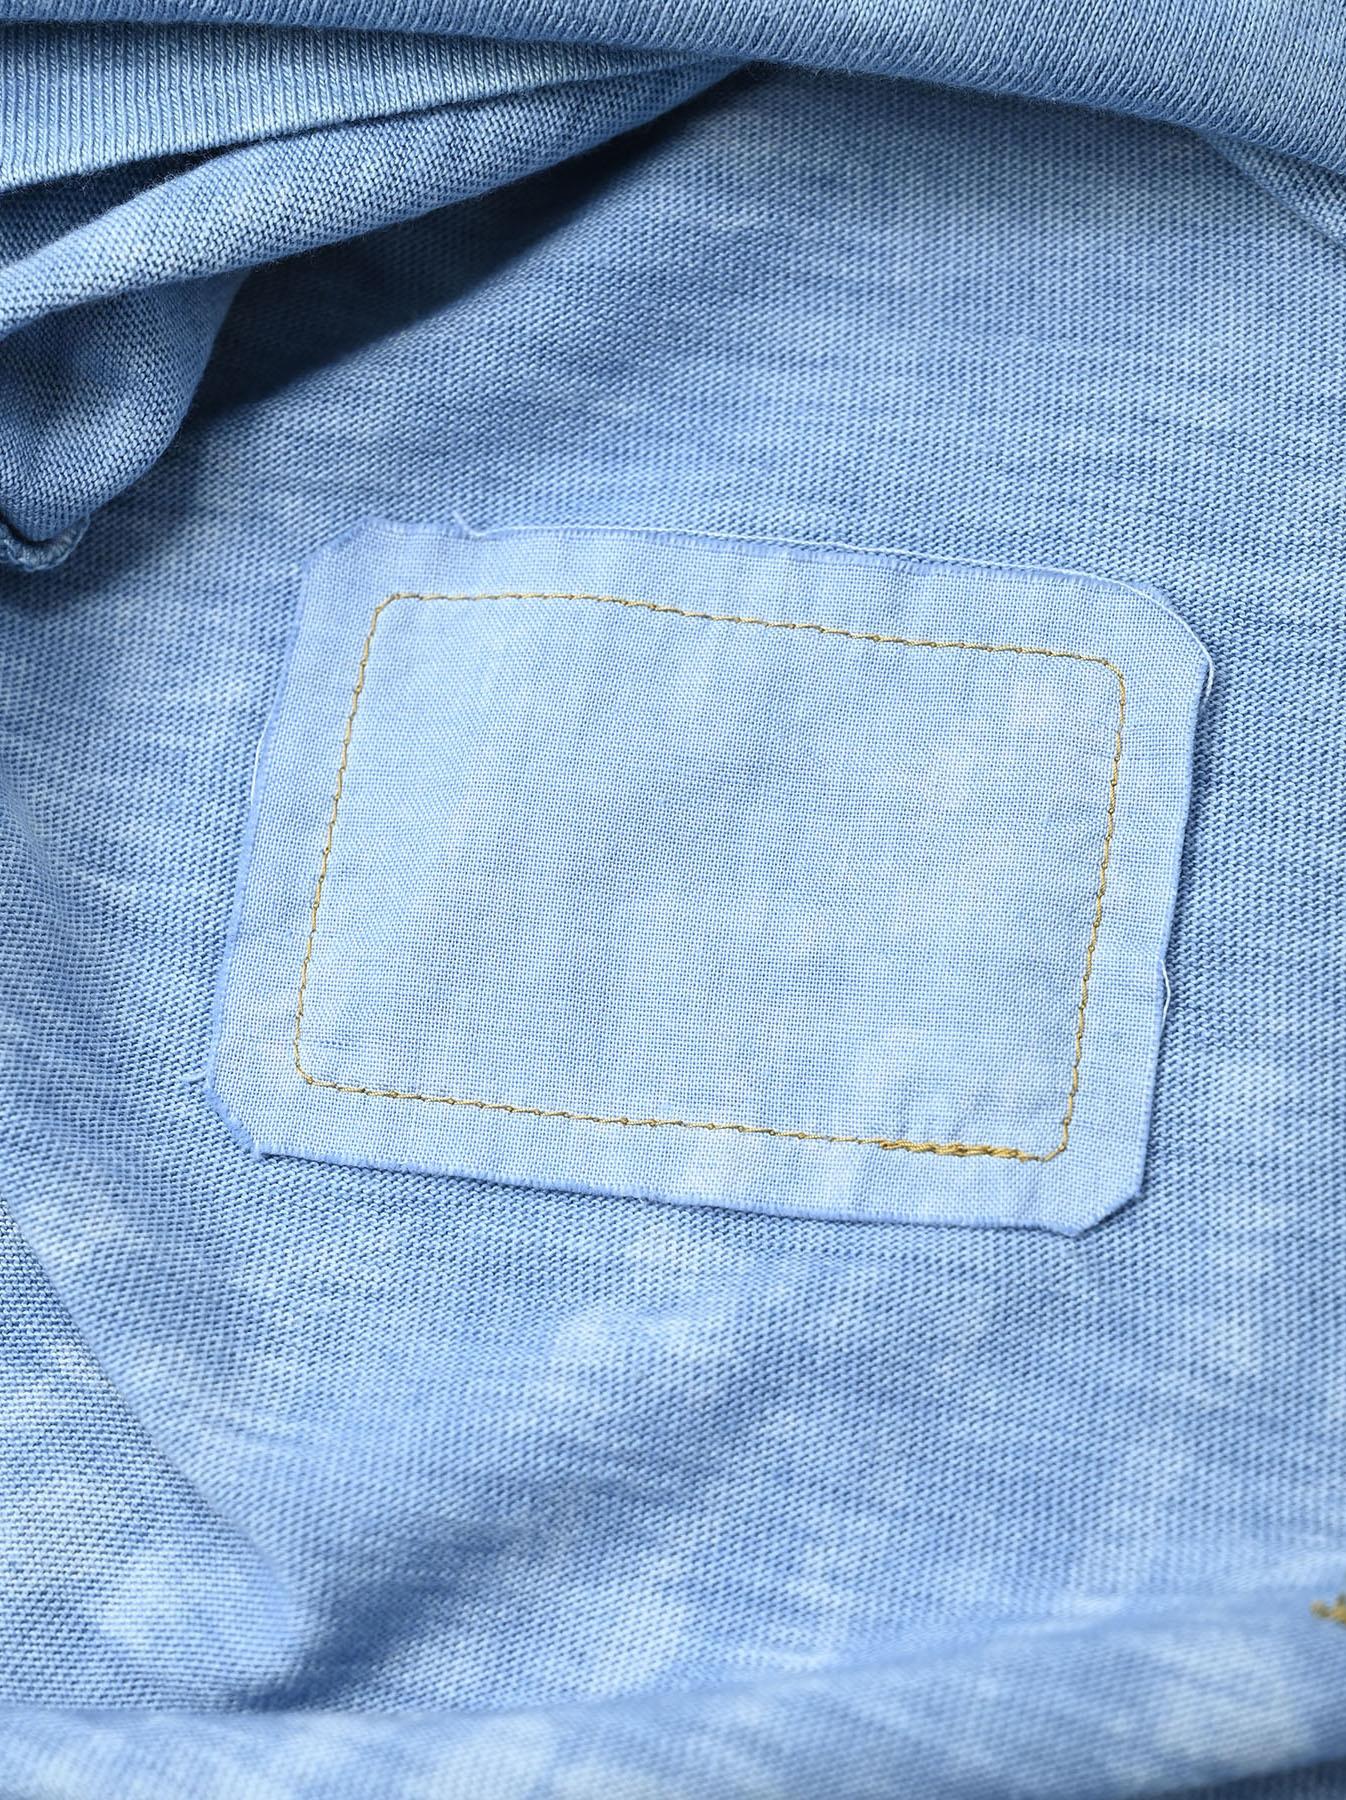 Ai Organic Supima Tenjiku Long-sleeved T-shirt-12